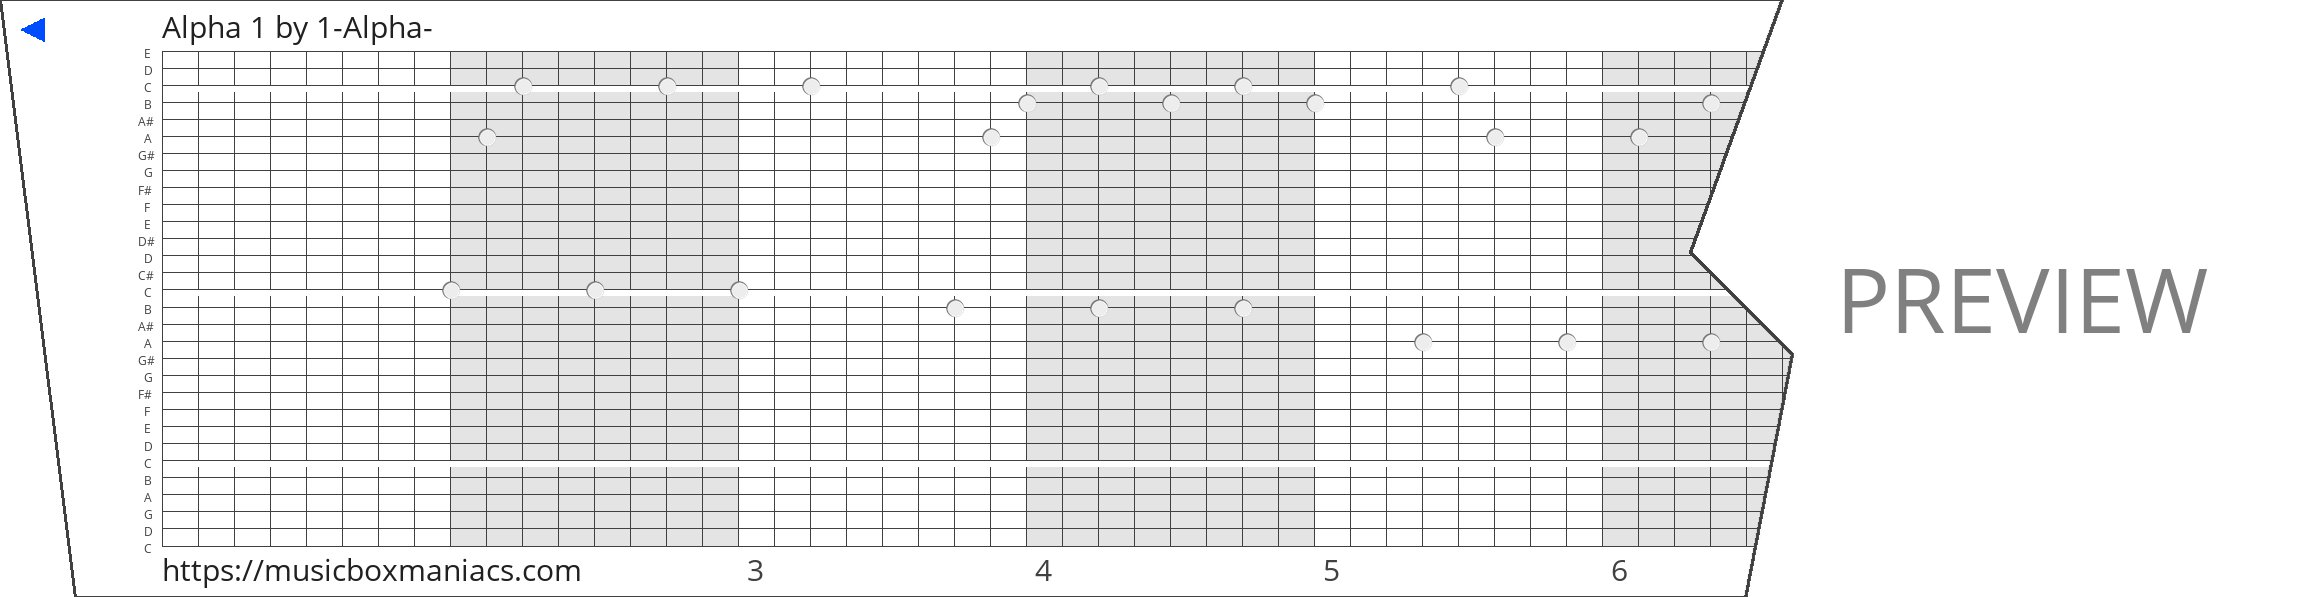 Alpha 1 30 note music box paper strip